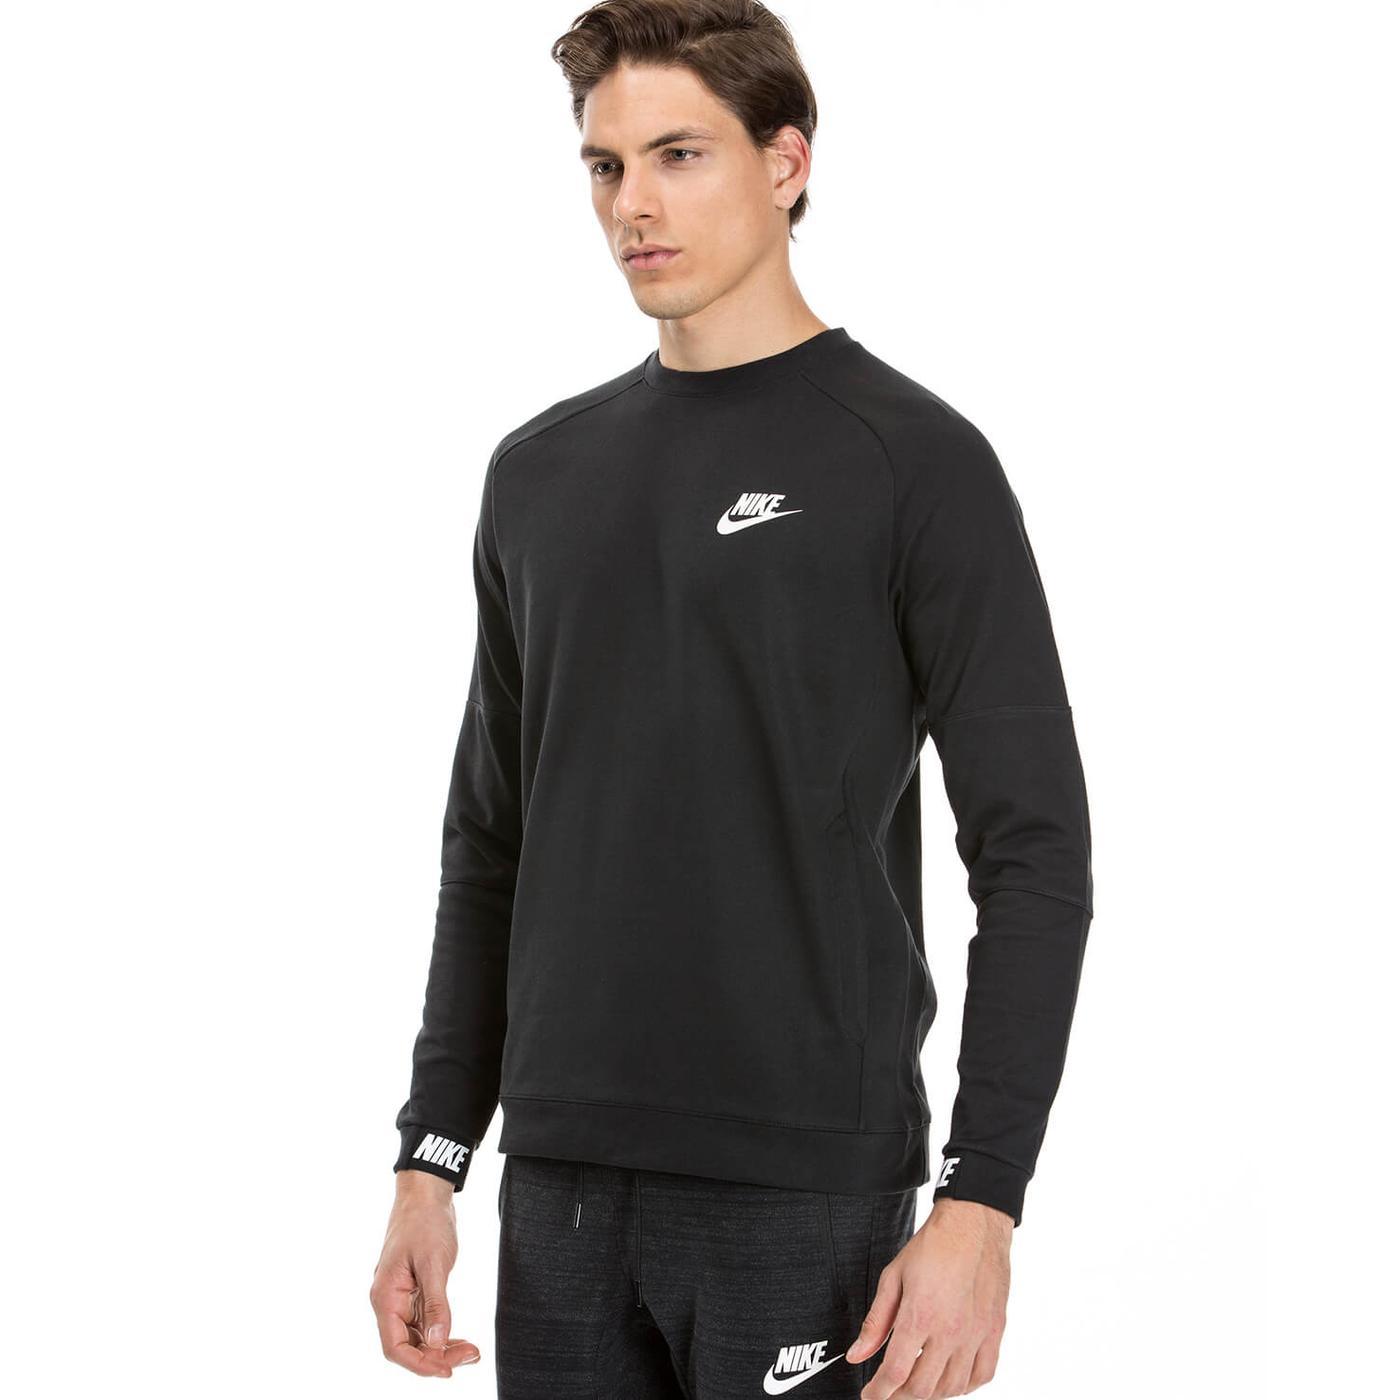 Nike Av15 Crw Flc Erkek Siyah Sweatshirt